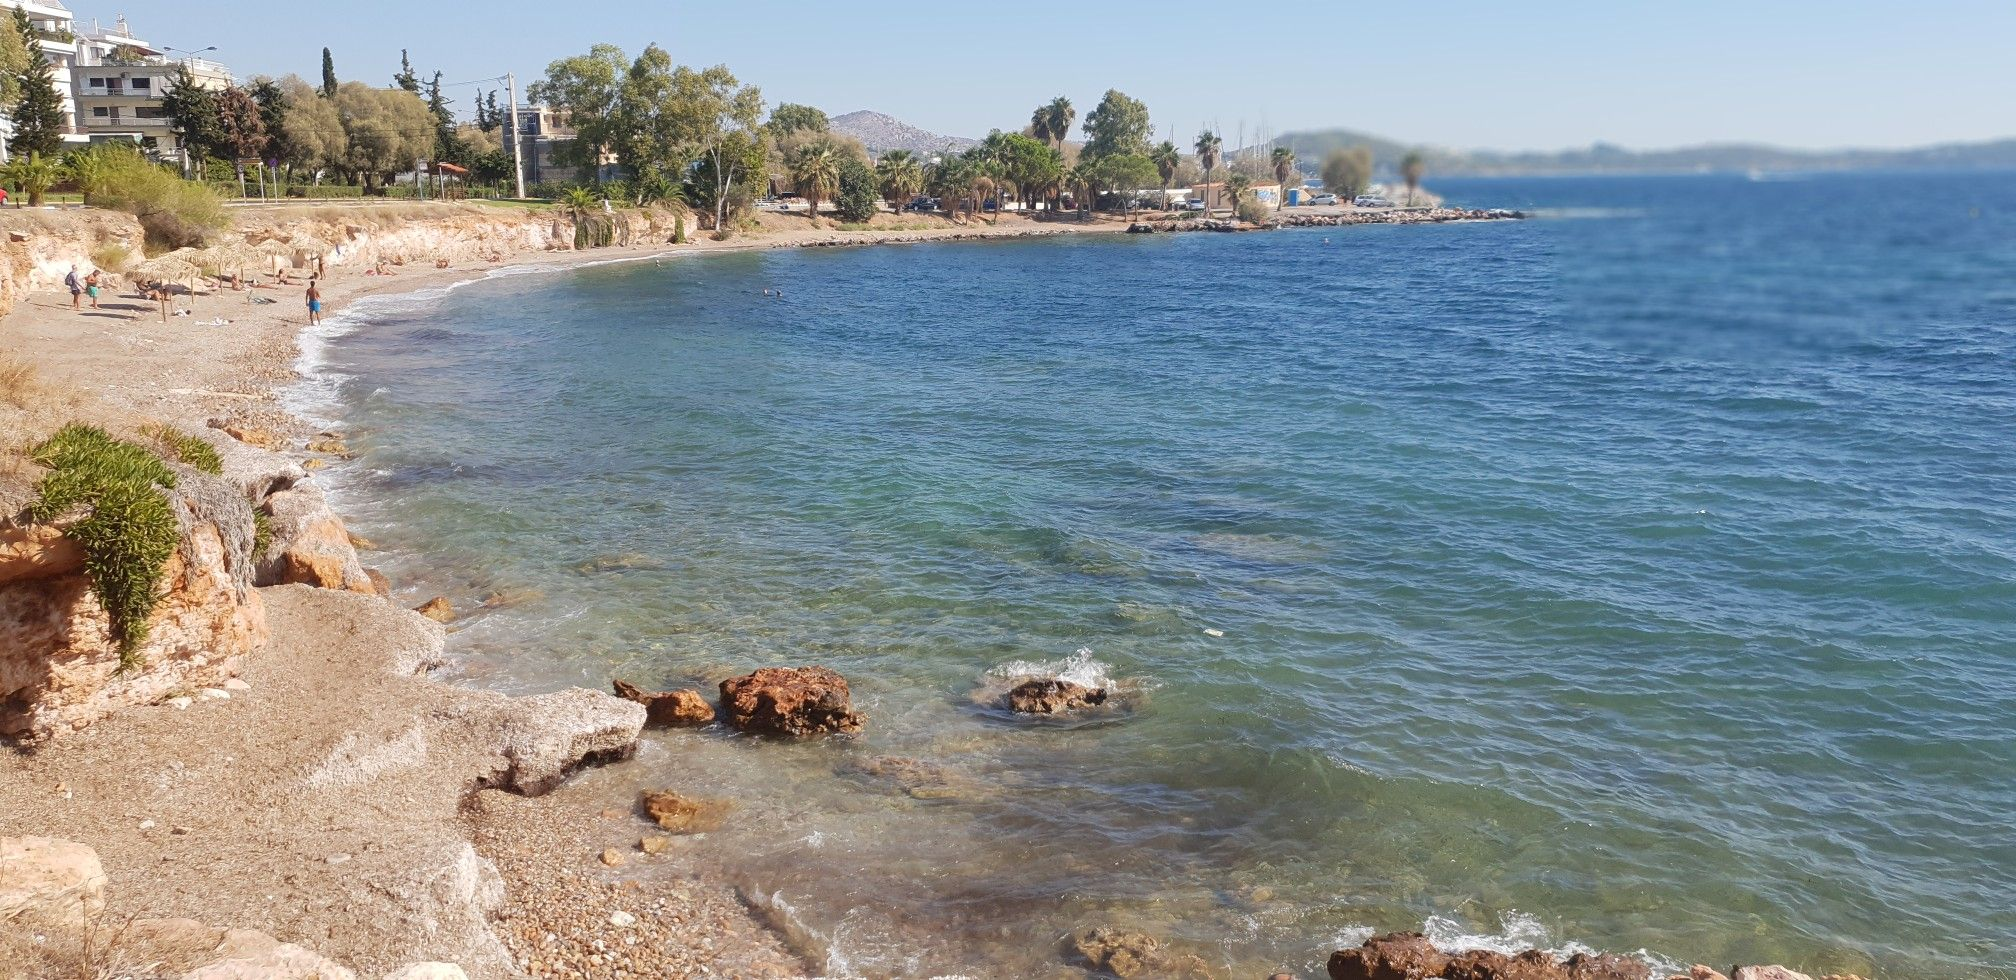 Pin by Σβήνω τα on Greek Beaches | Beach, Outdoor, Greece